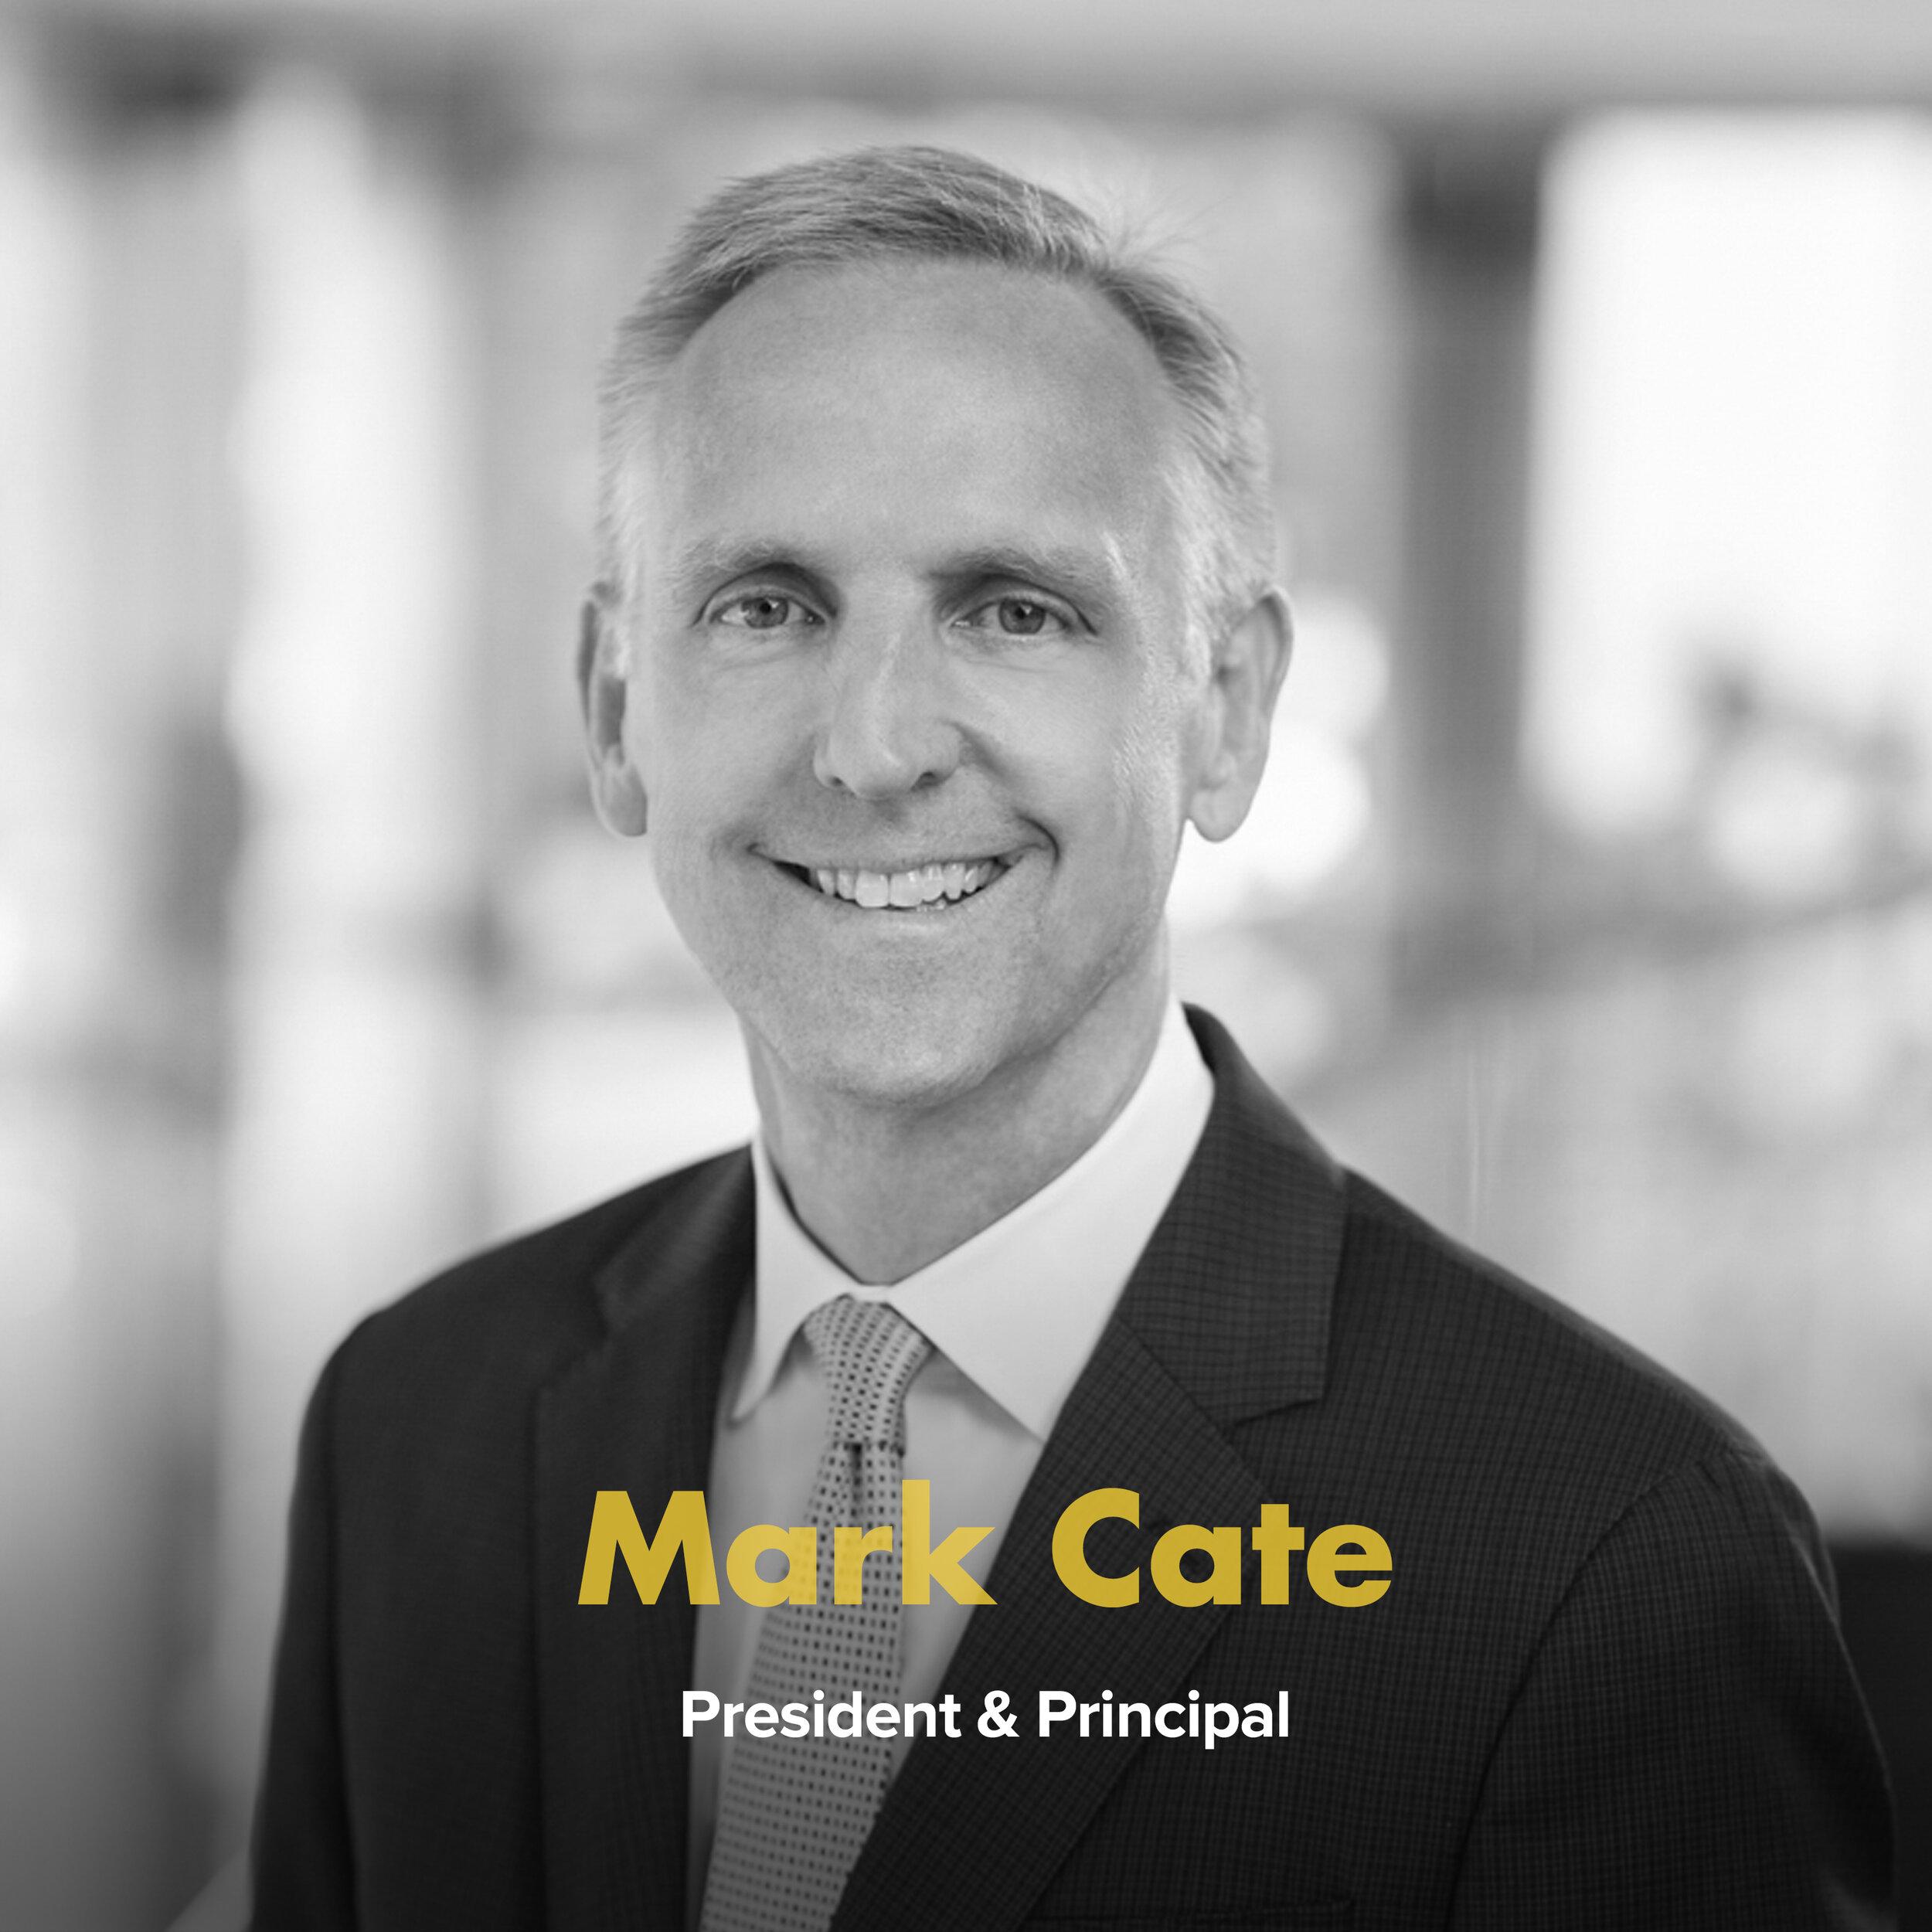 Mark Cate